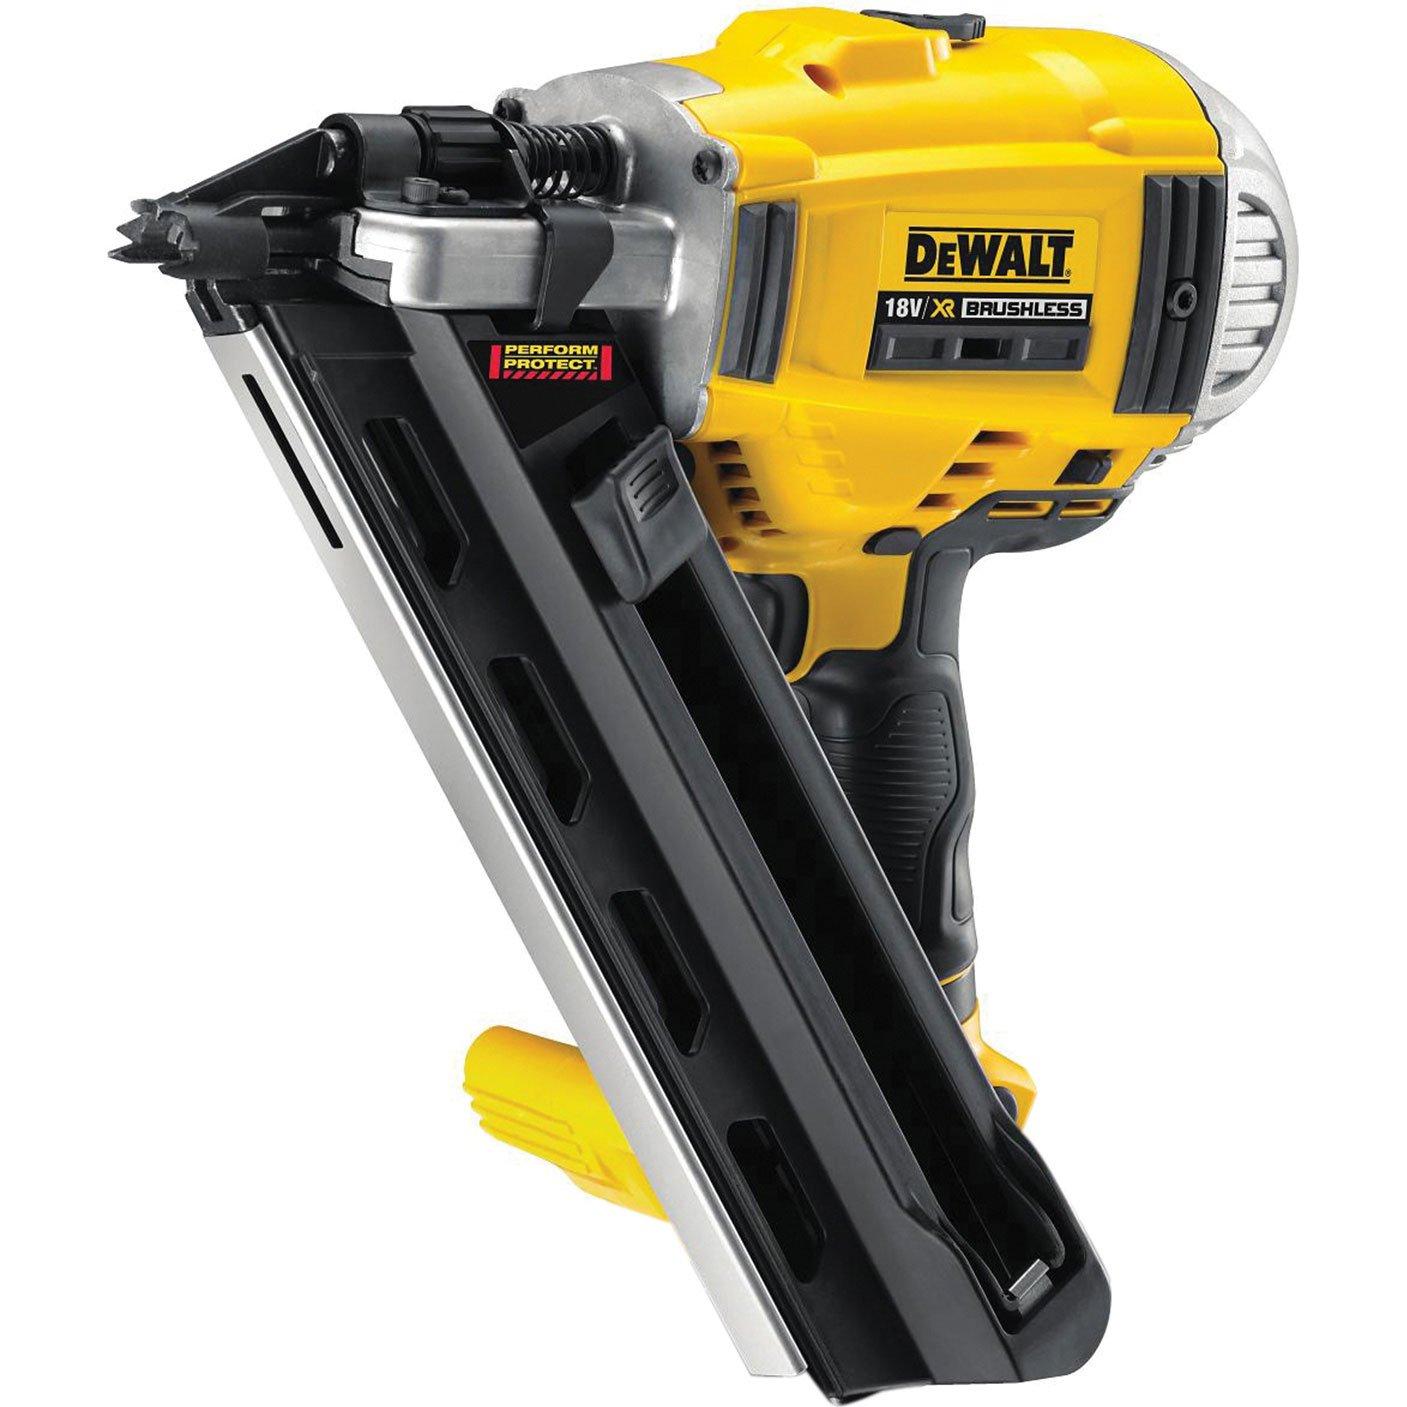 Dewalt DCN692N 18v Cordless XR Framing Nail Gun 90mm without Battery ...